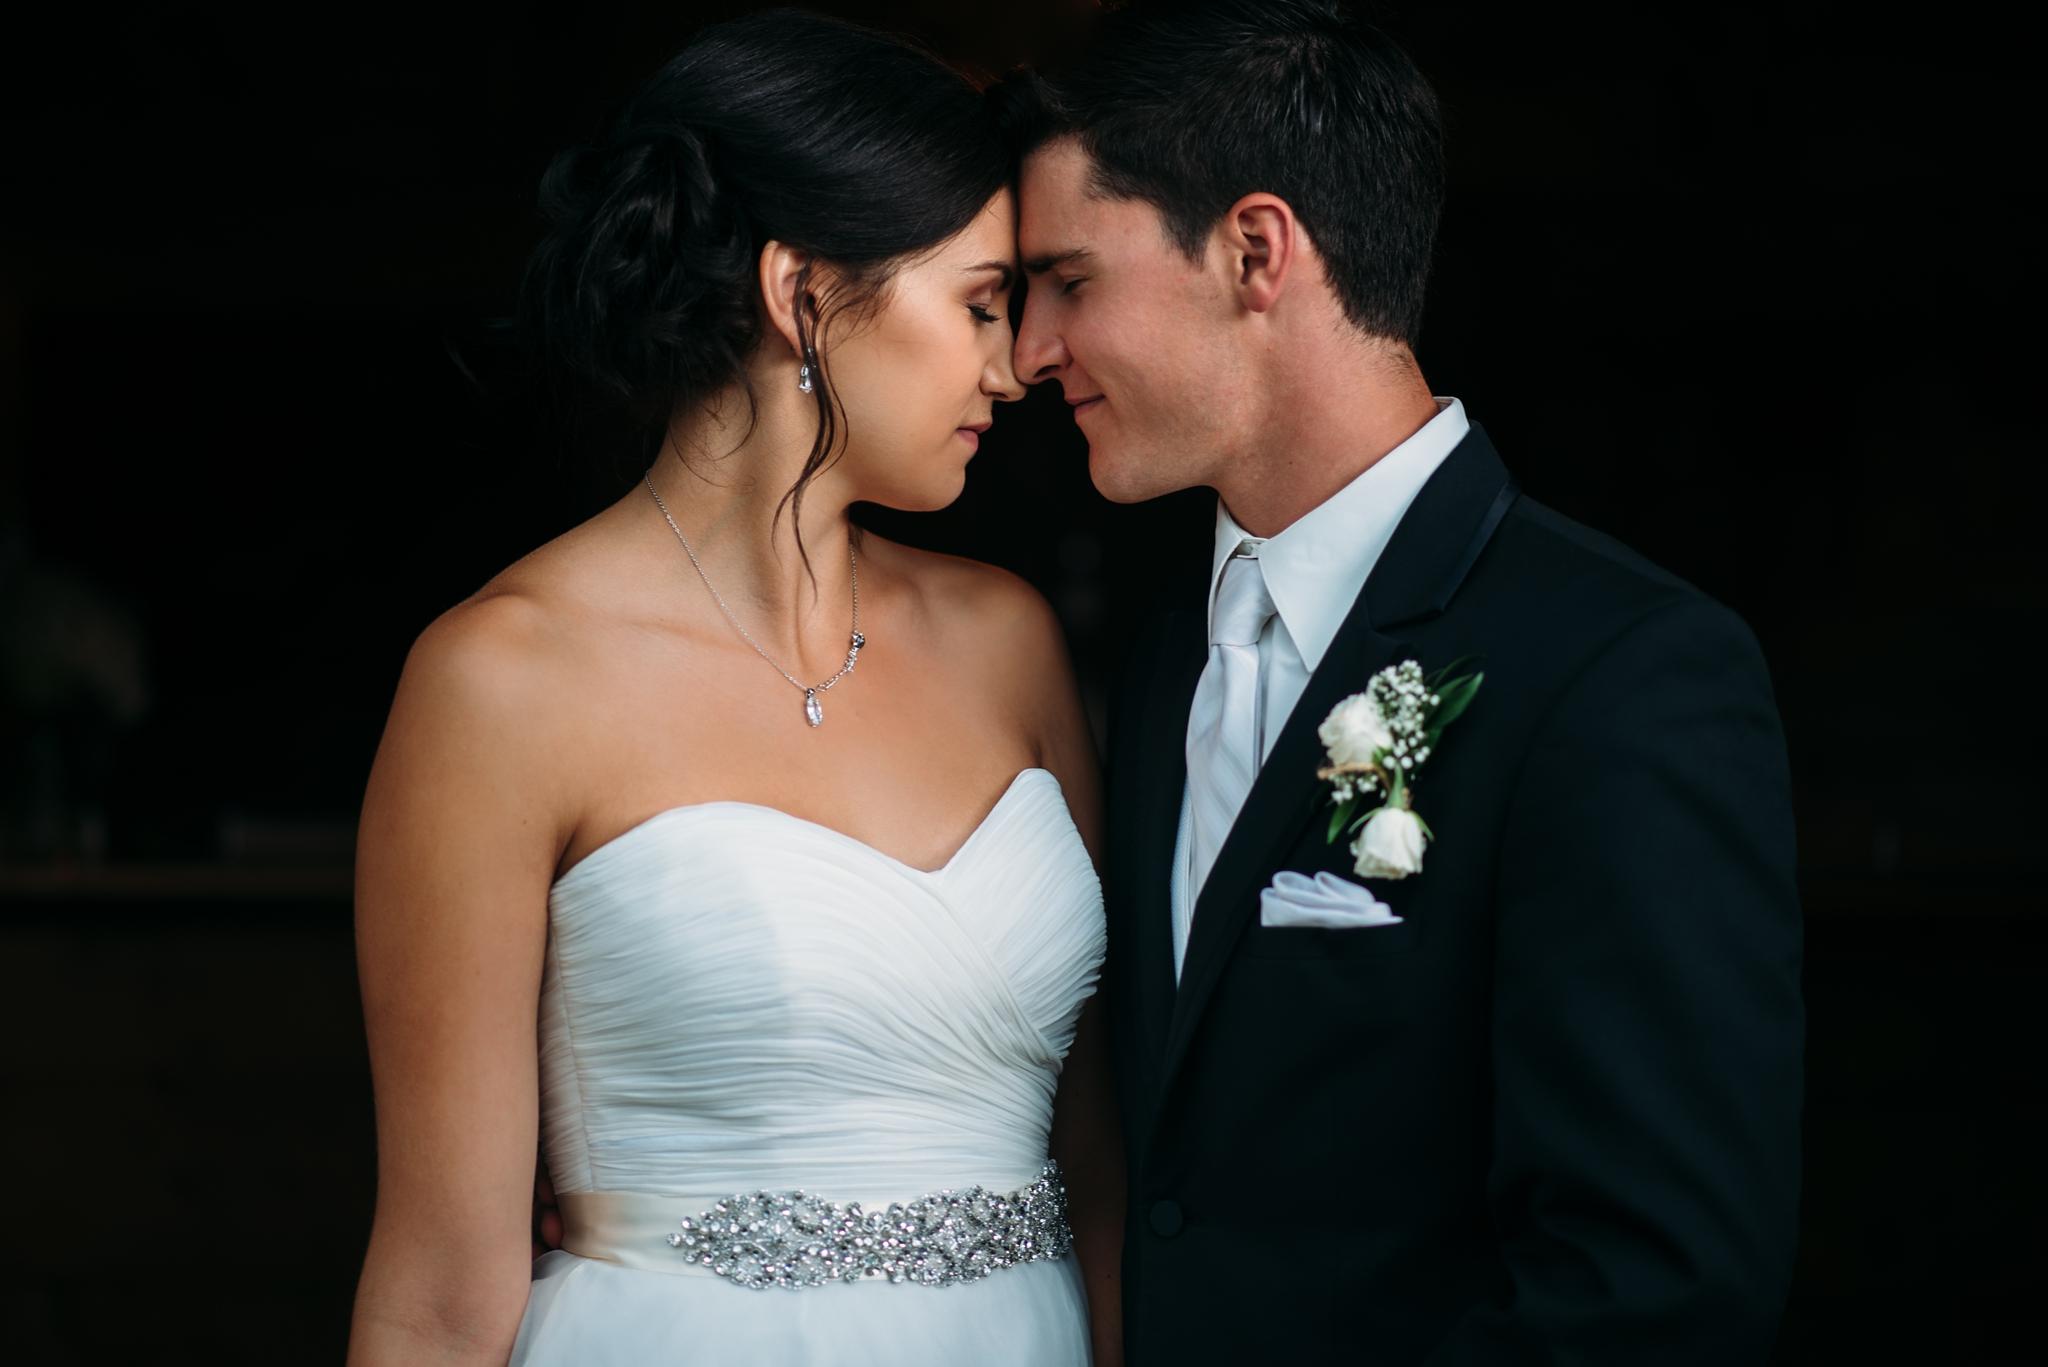 kaihla_tonai_intimate_wedding_elopement_photographer_0109